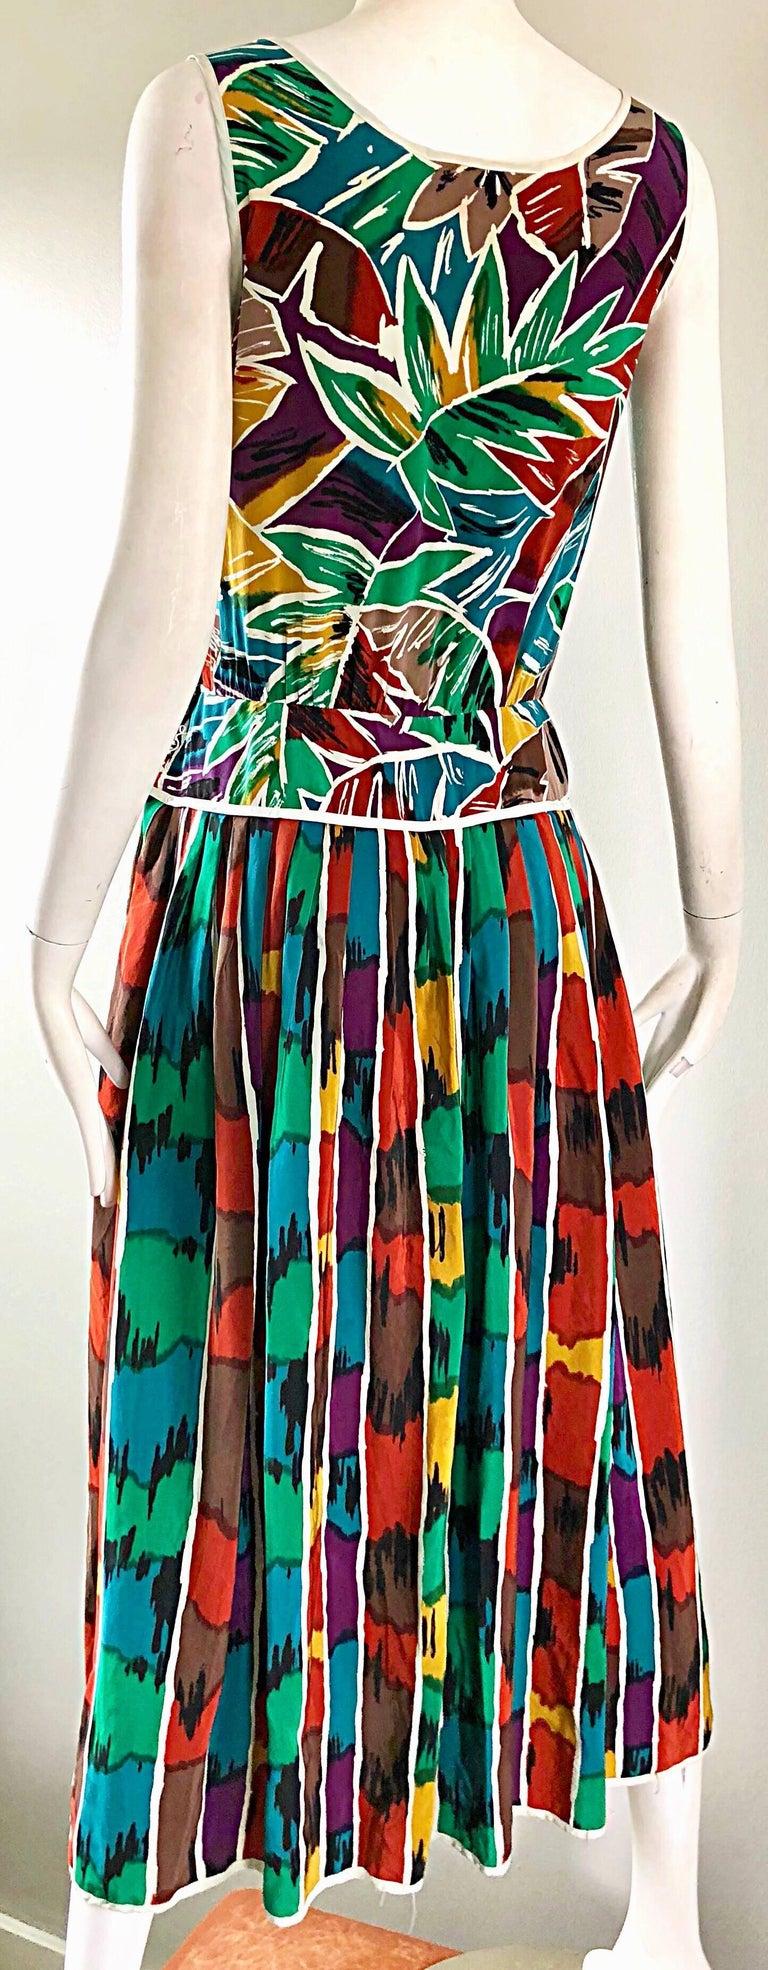 Vintage Oscar de la Renta Size 8 / 10 Kaleidoscope Print Silk Sleeveless Dress For Sale 4